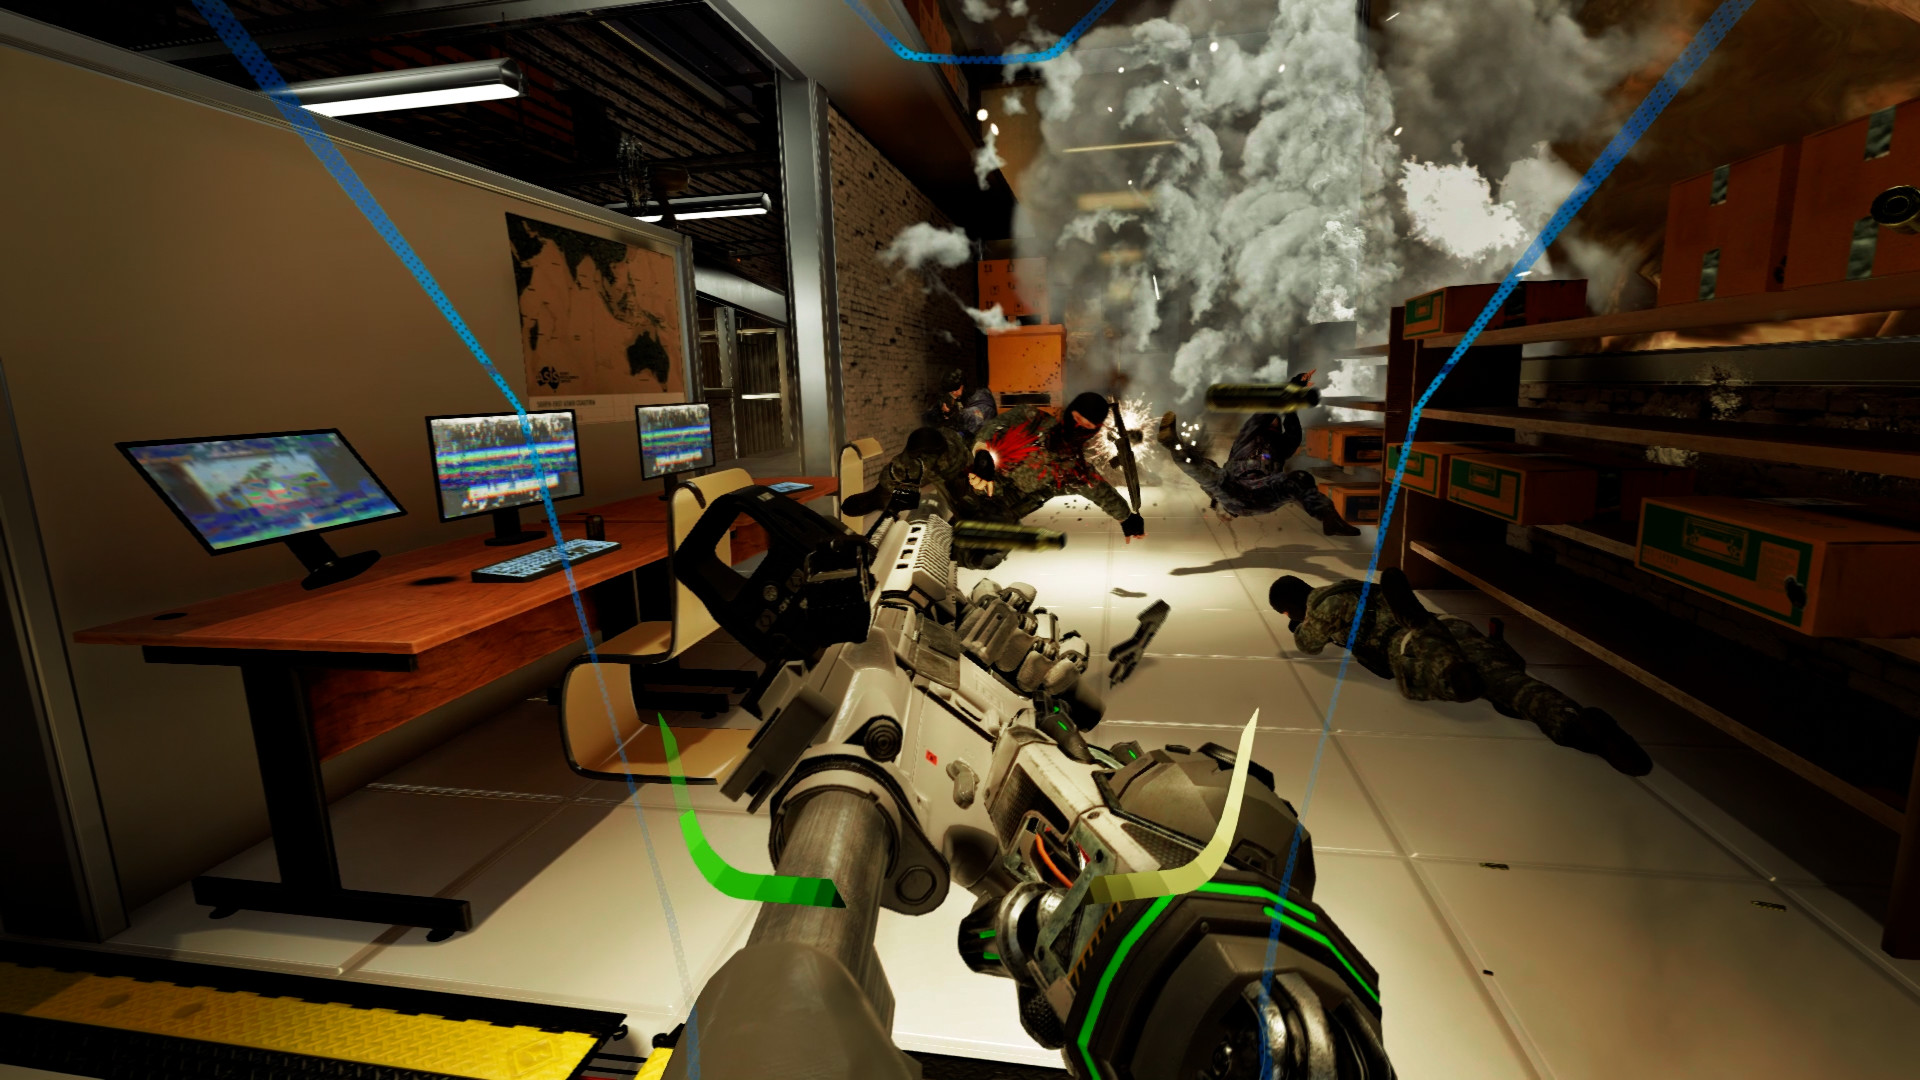 Espire-1-Operative-VR-Oculus-Rift-HTC-Vive